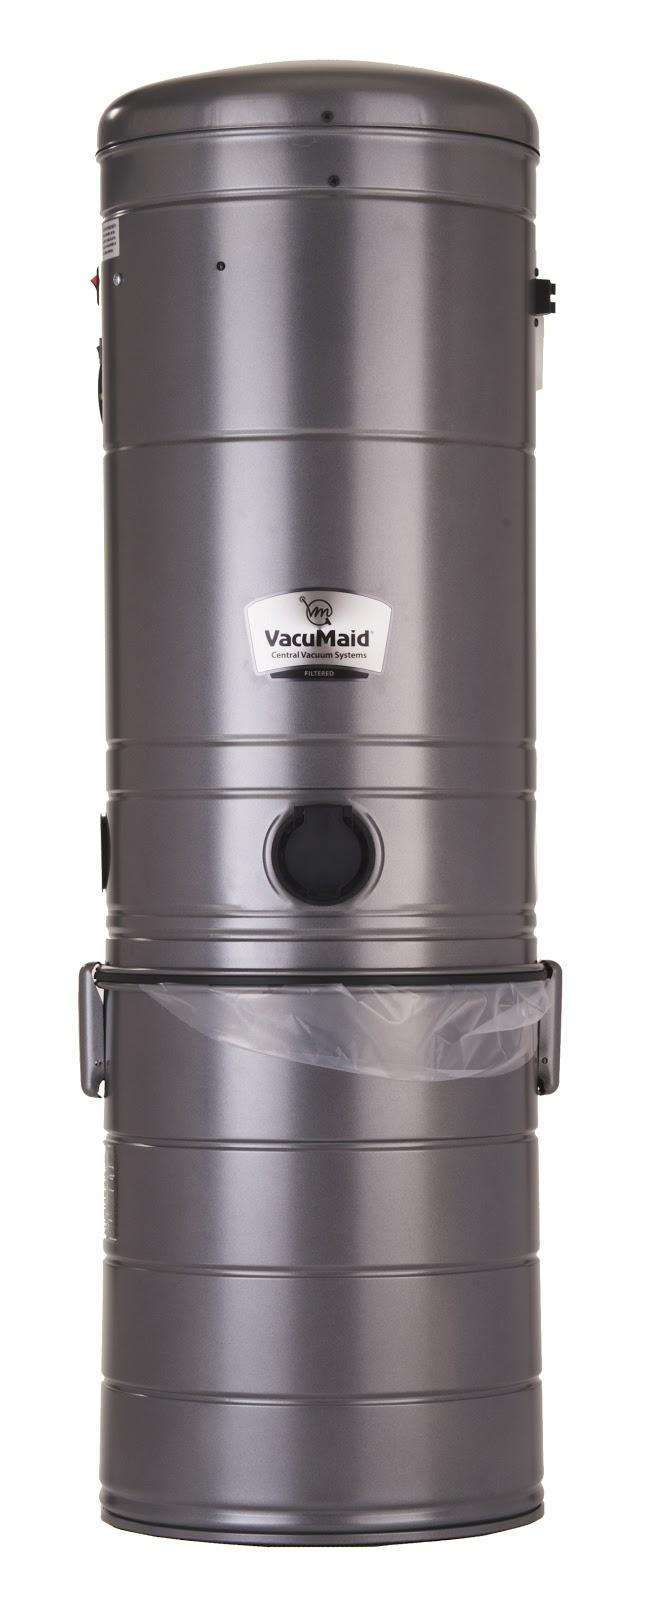 VacuMaid SR66 Central Vacuum Power Unit